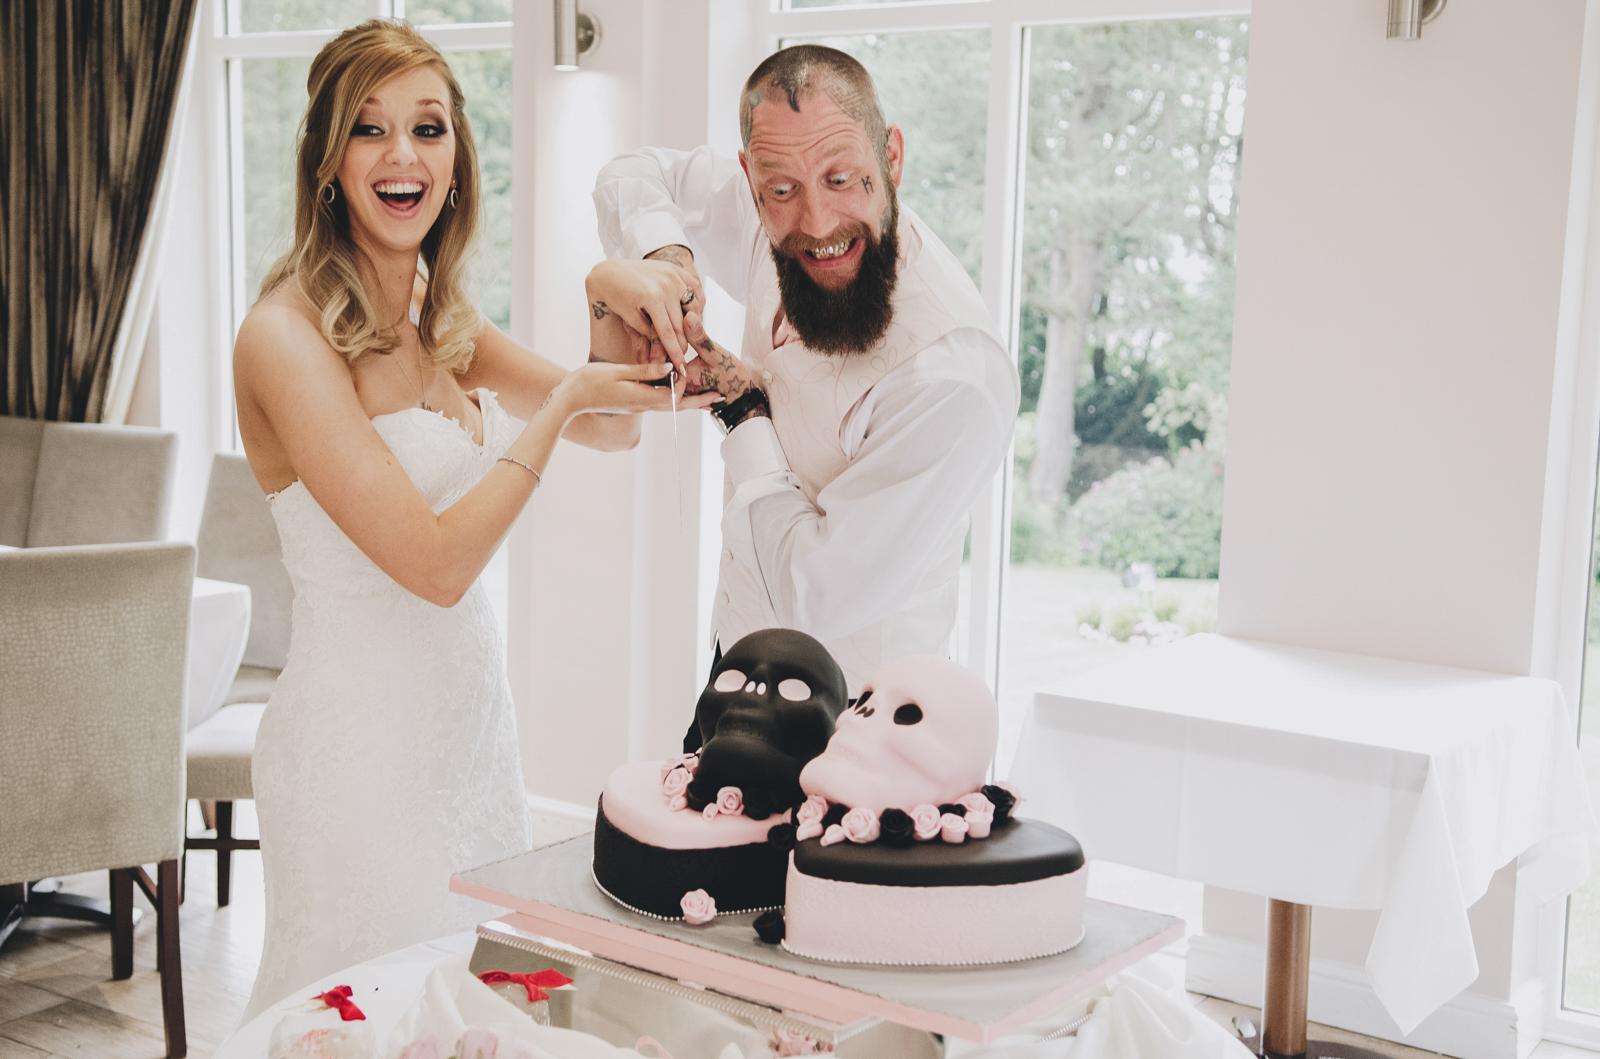 Alternative-North-West-Manchester-Wedding-Photography-Astley-bank-Wedding-skull-cake-tattooed-groom-37.jpg